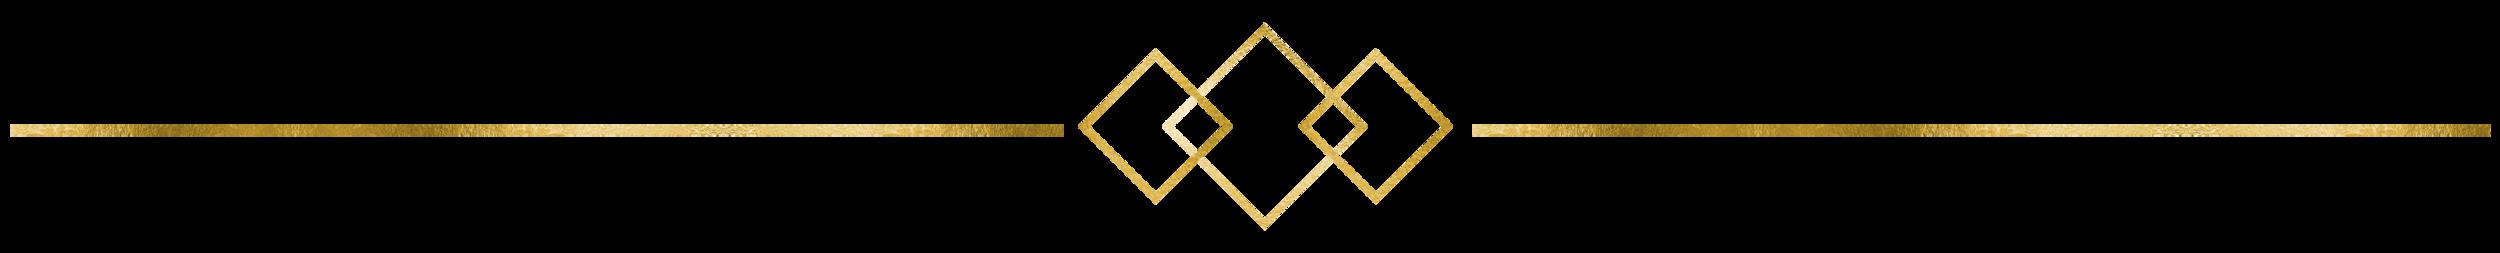 KMP-Line-diamonds.png